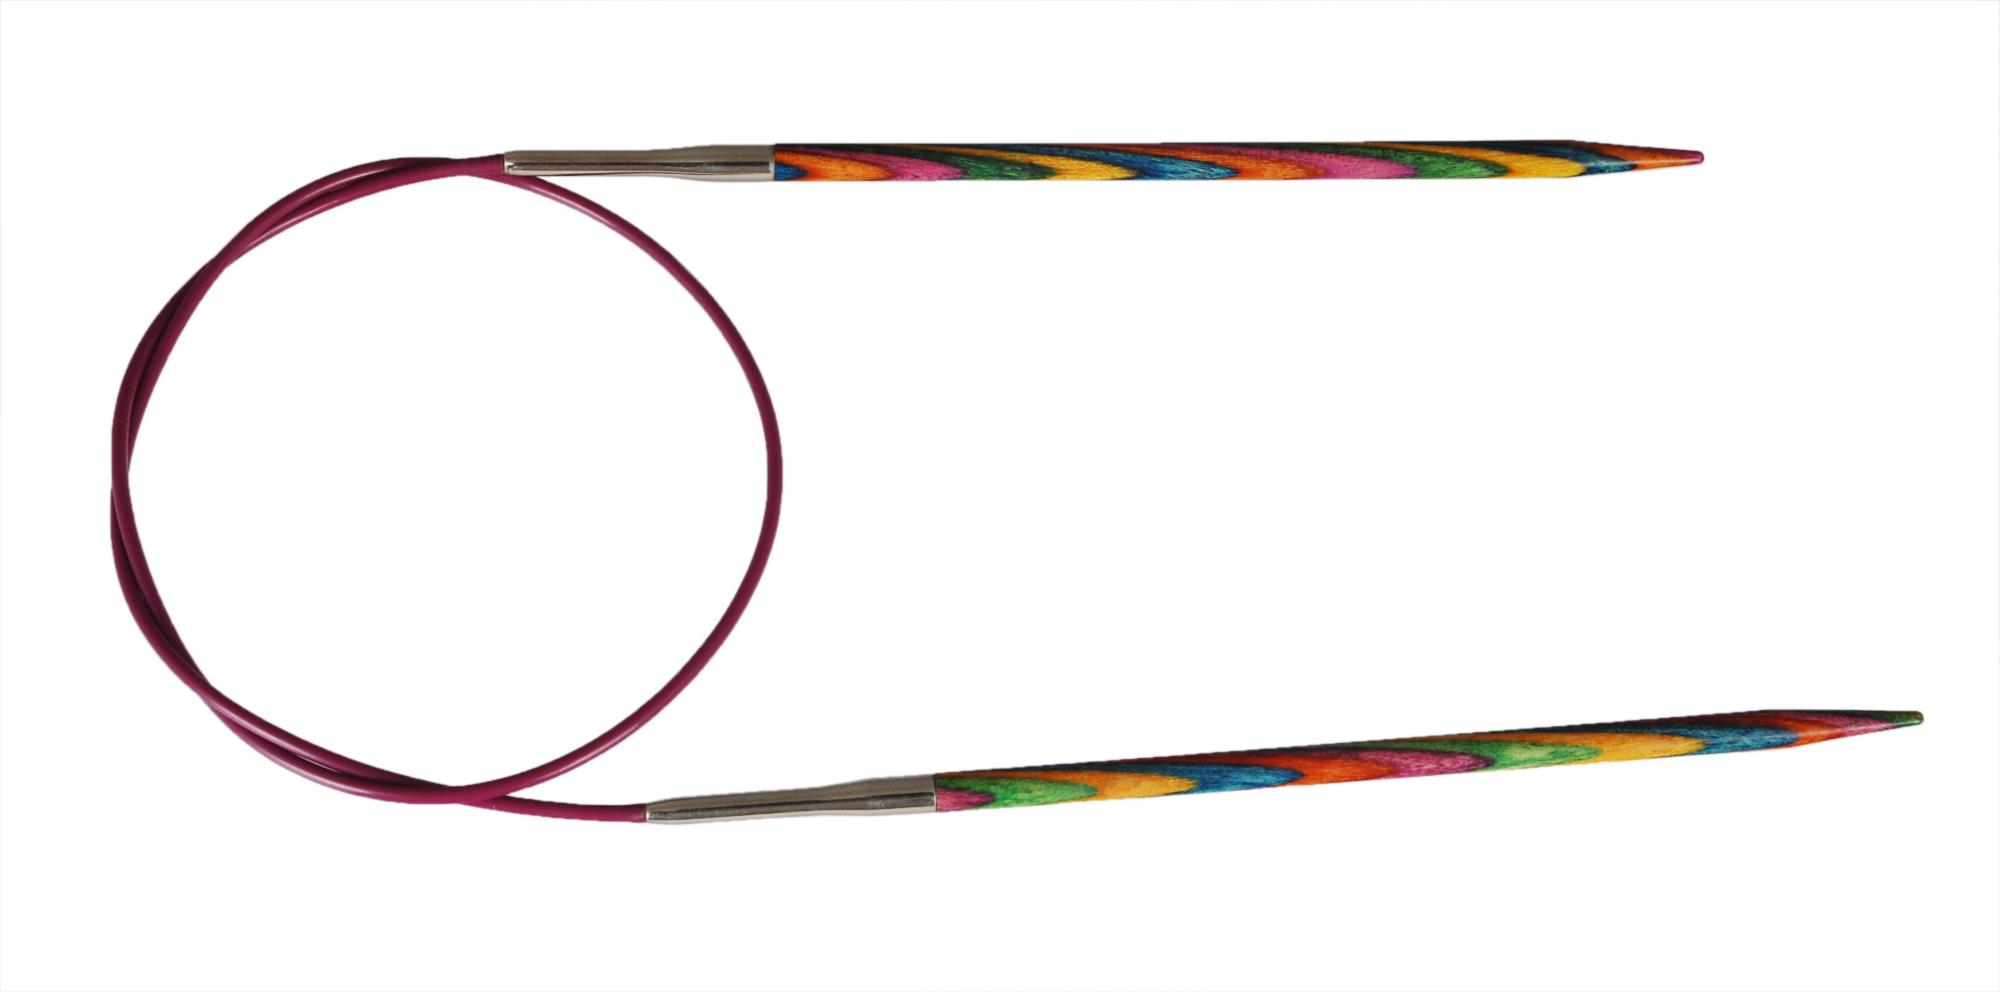 Спицы круговые 120 см Symfonie Wood KnitPro, 21371, 6.00 мм